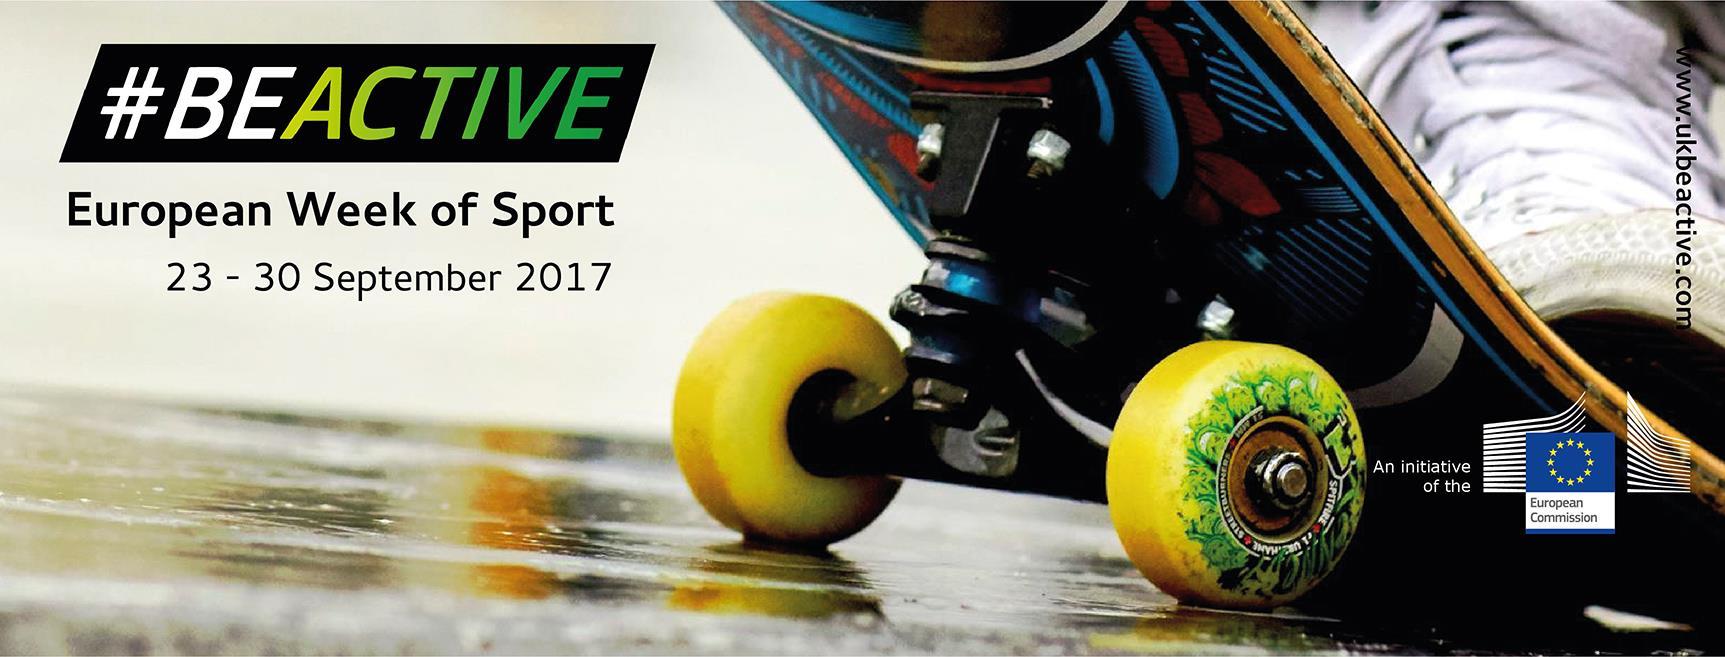 Facebook cover skateboard ()